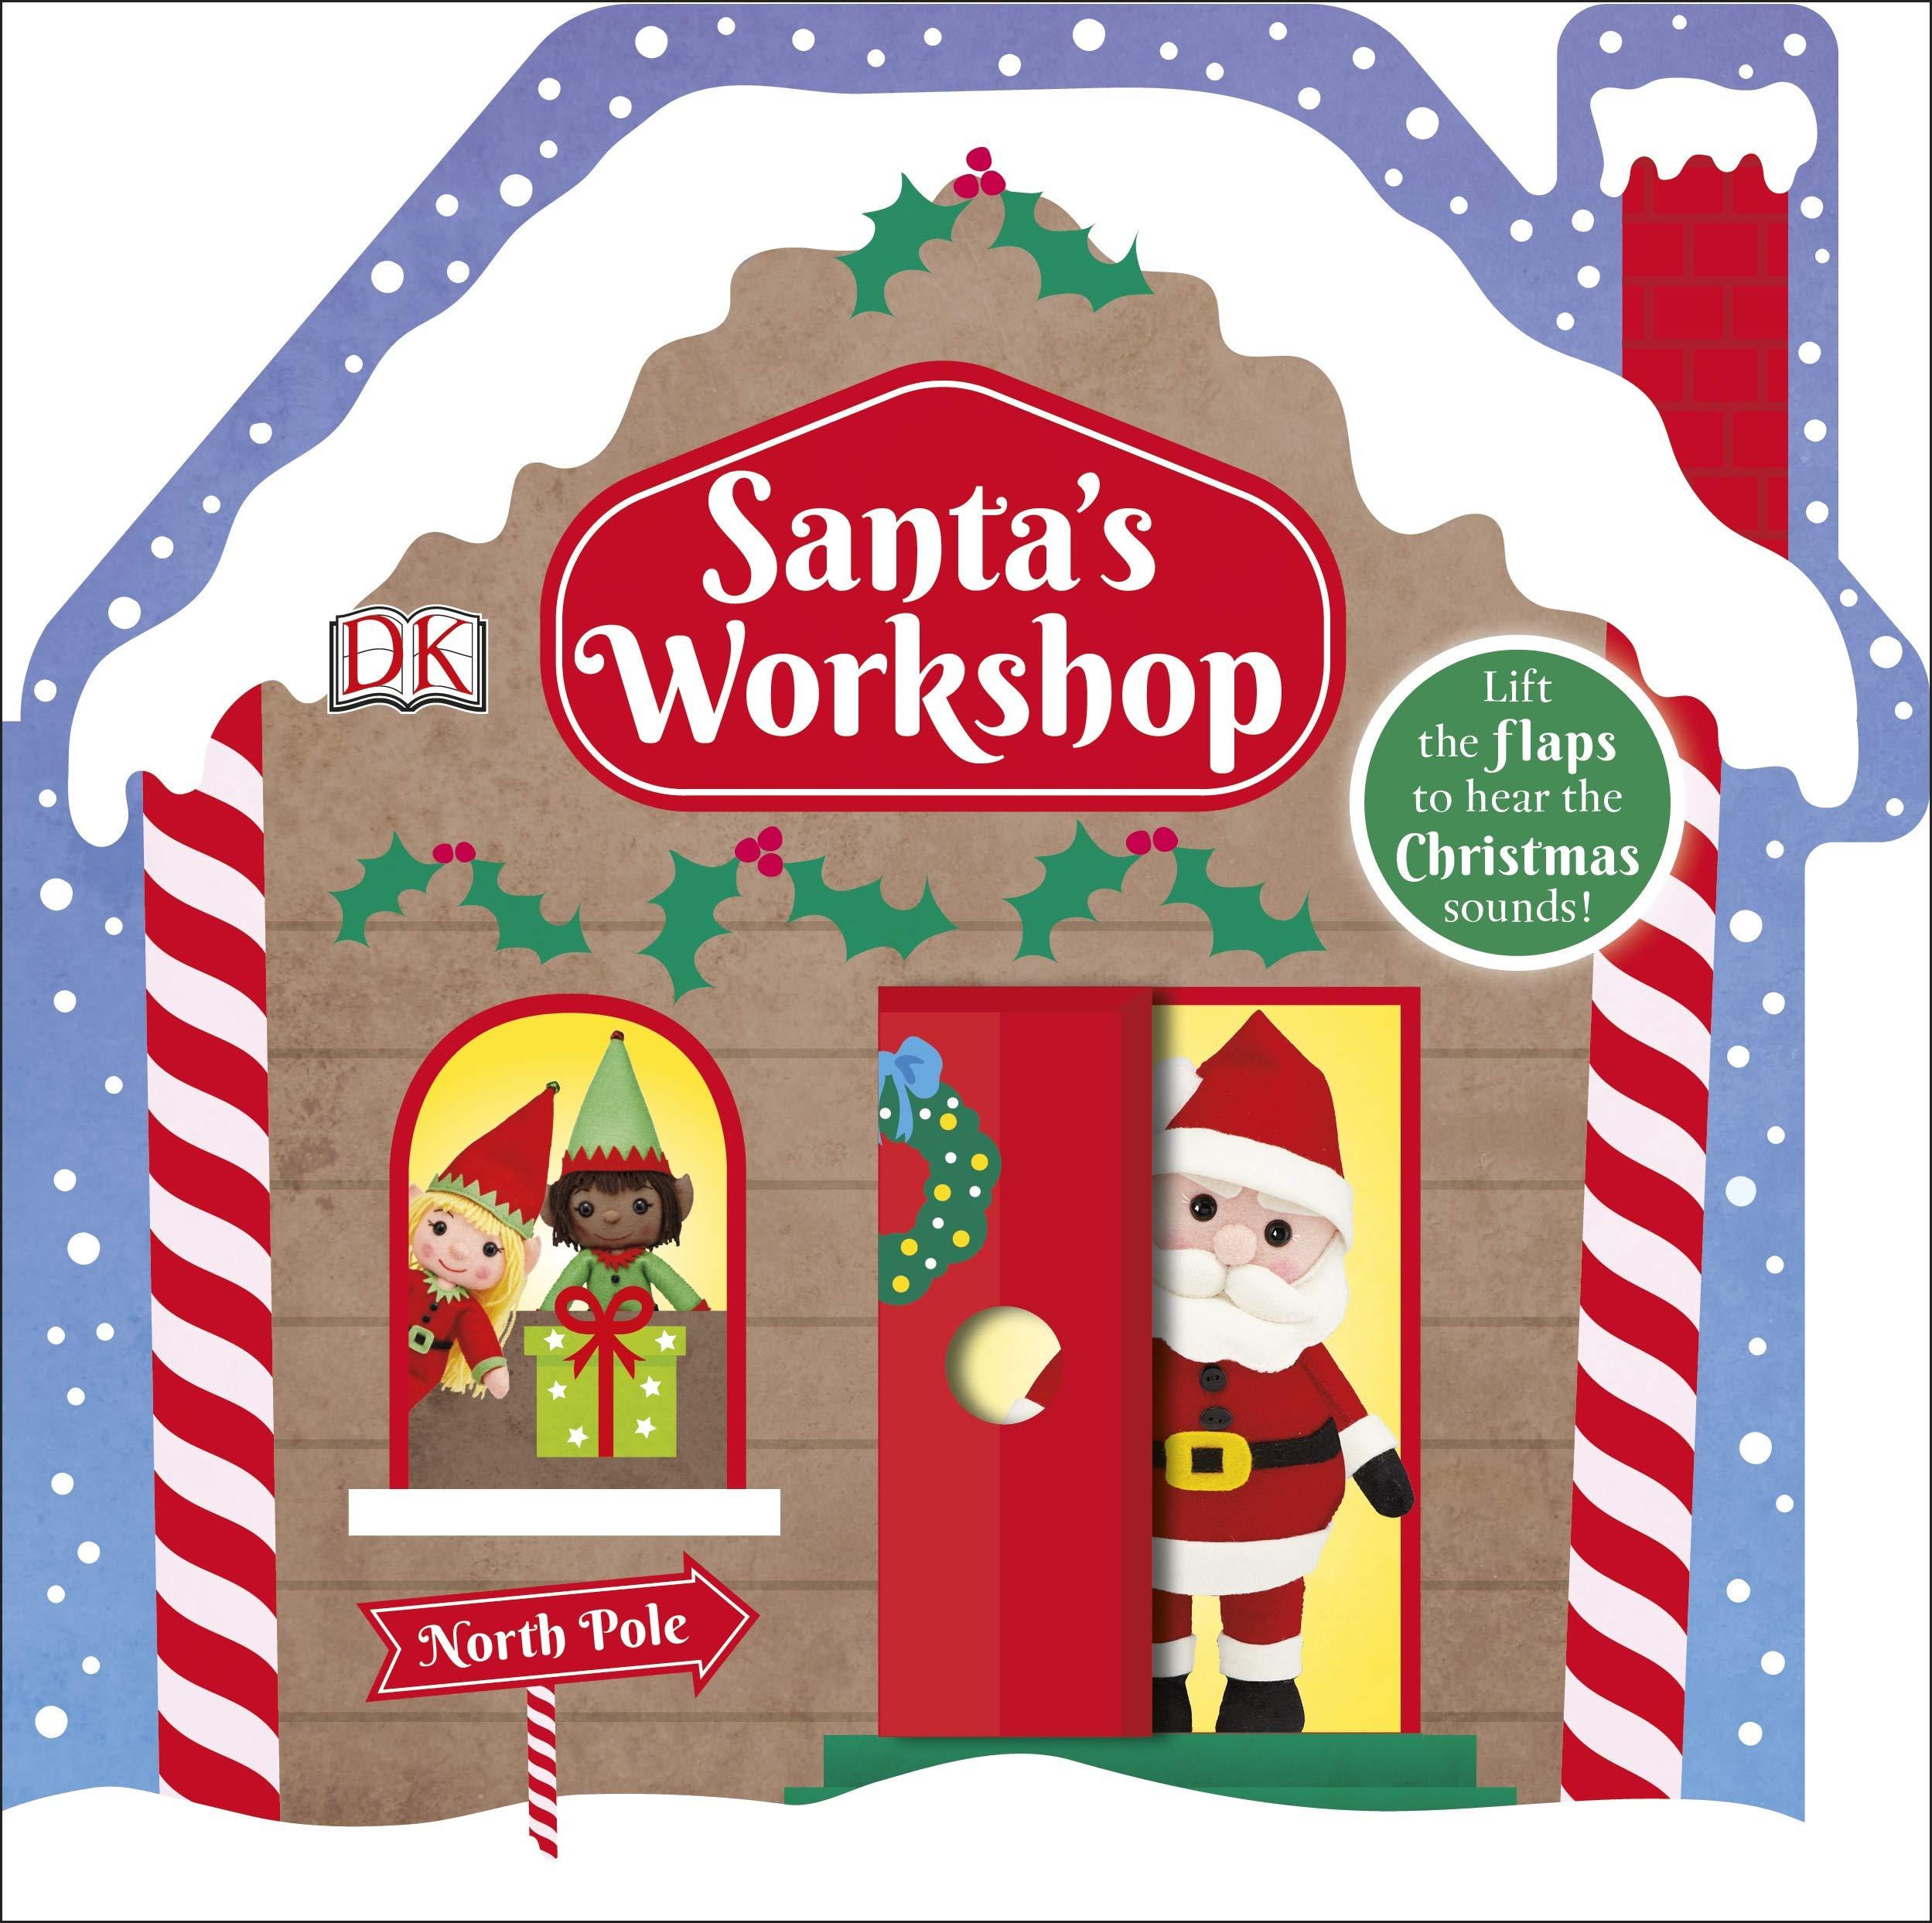 Santa\'s Workshop: Amazon.co.uk: DK: 9780241363270: Books.